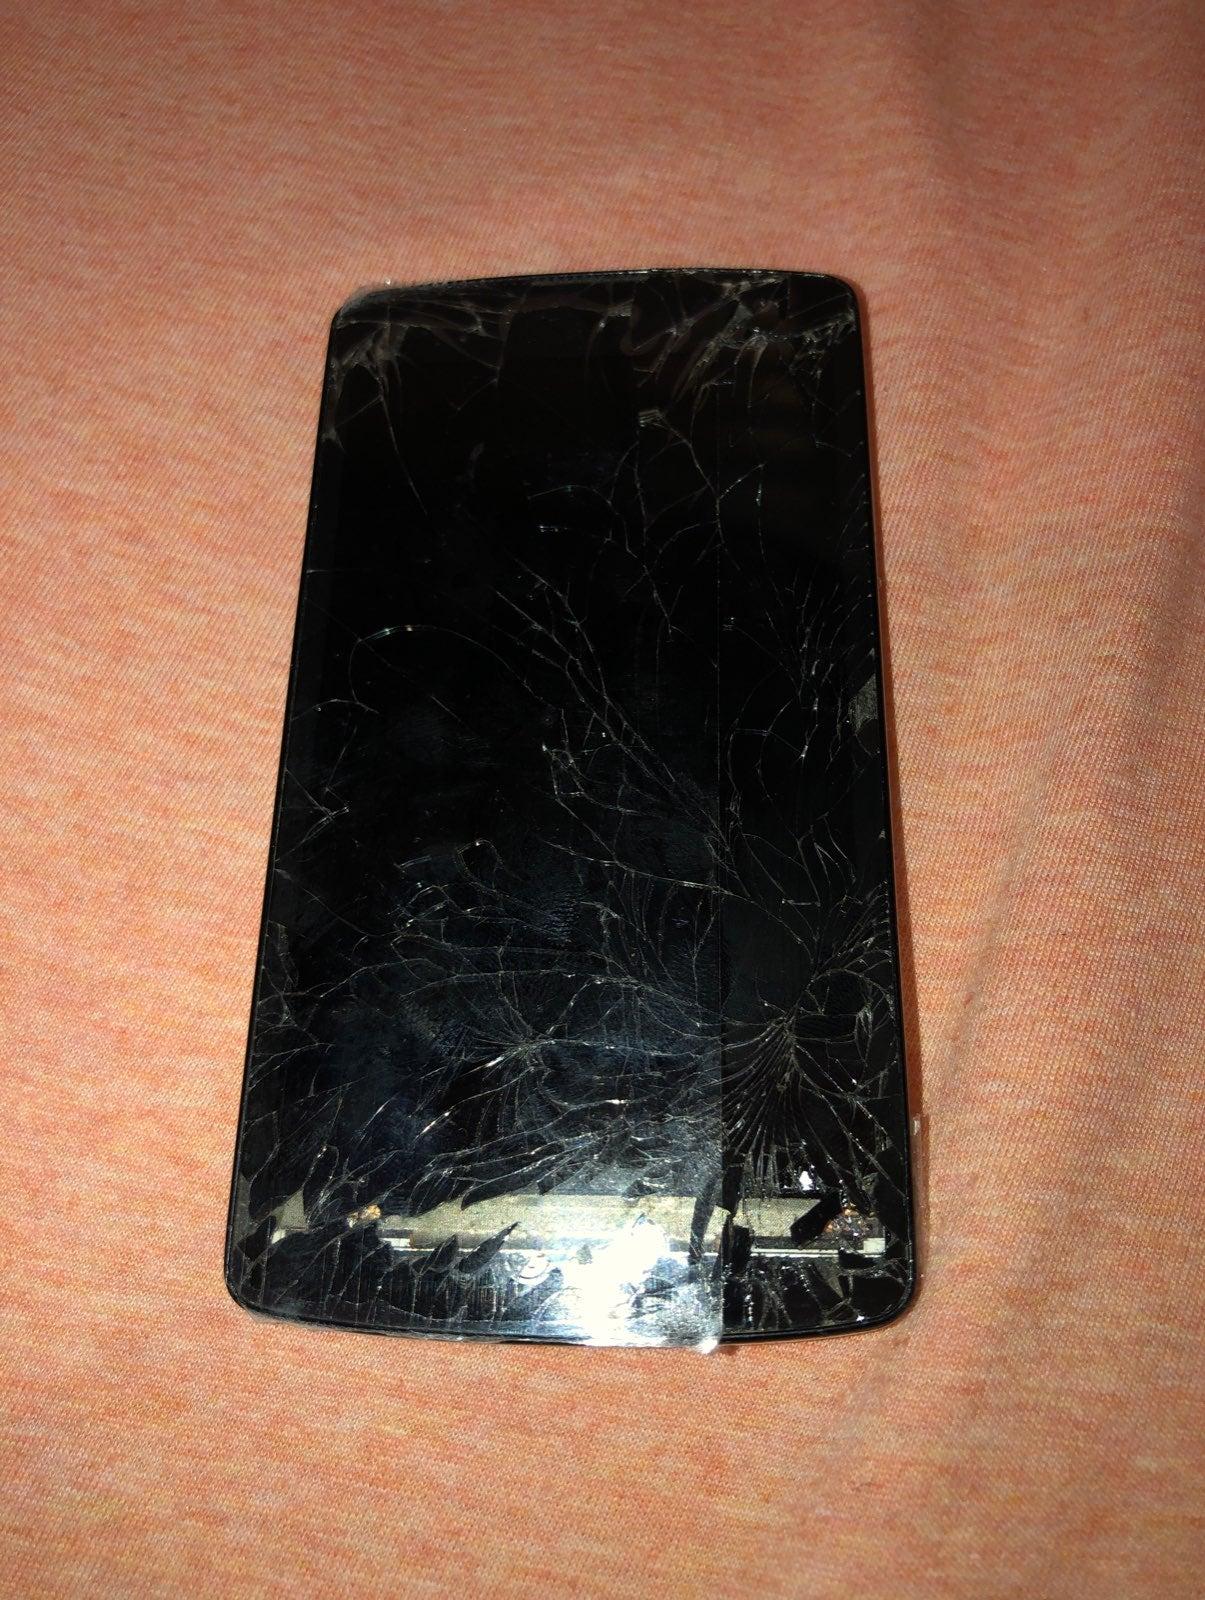 LG Smartphone (parts)